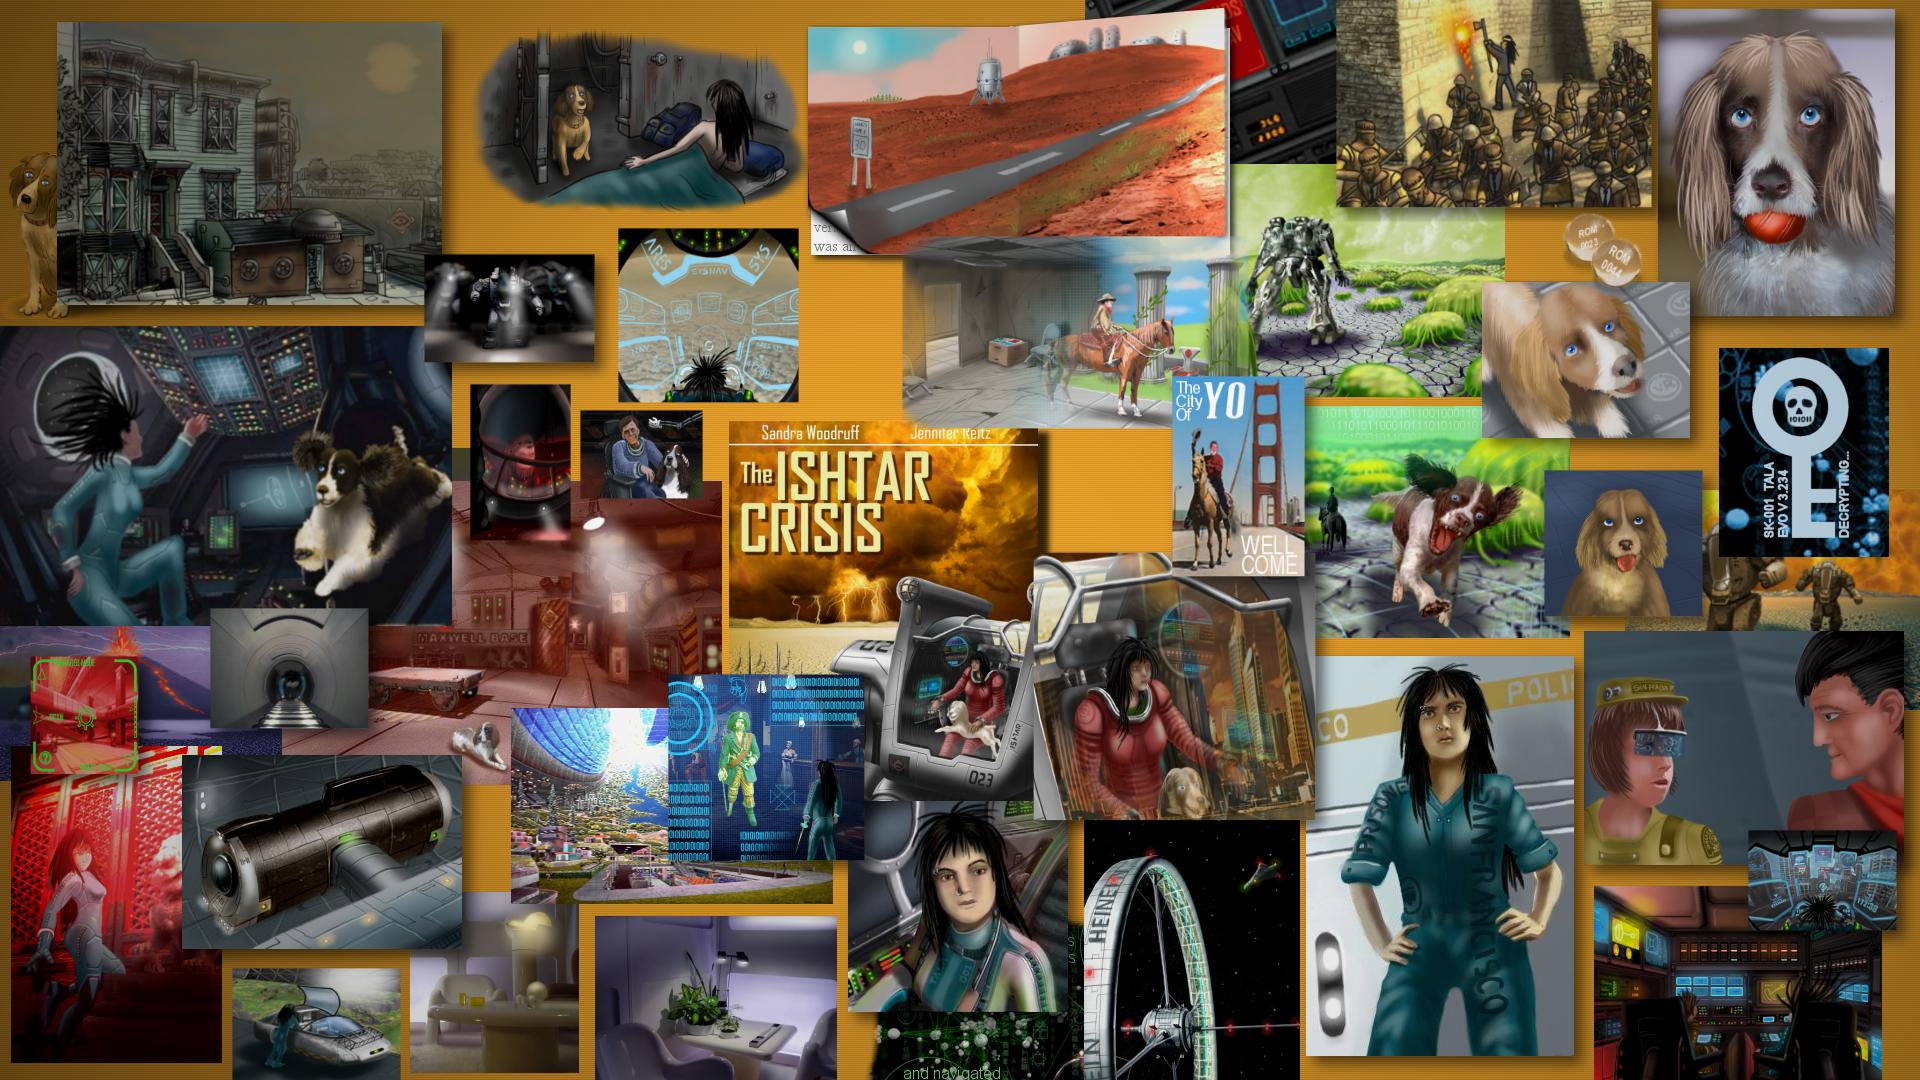 Ishtar Crisis Desktop by Aealacreatrananda